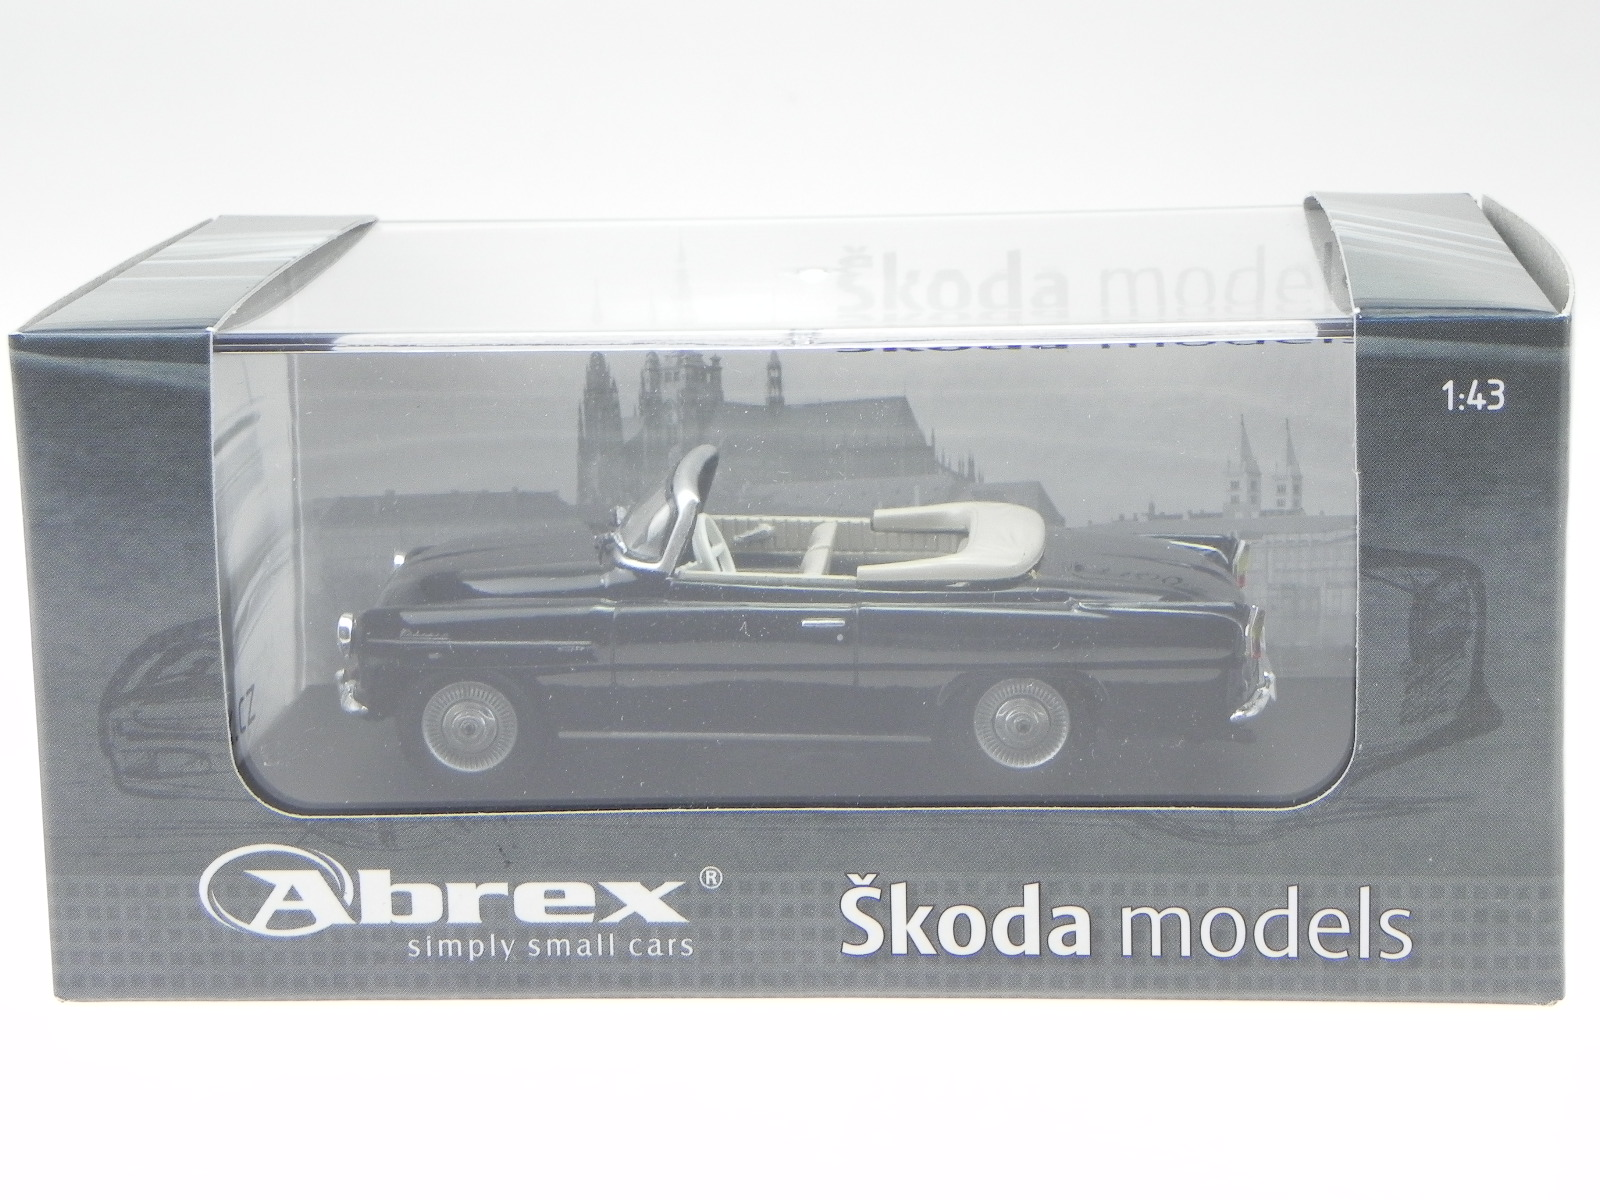 Skoda Felicia 1963 schwarz Modellauto 143ABS-703D Abrex 1:43